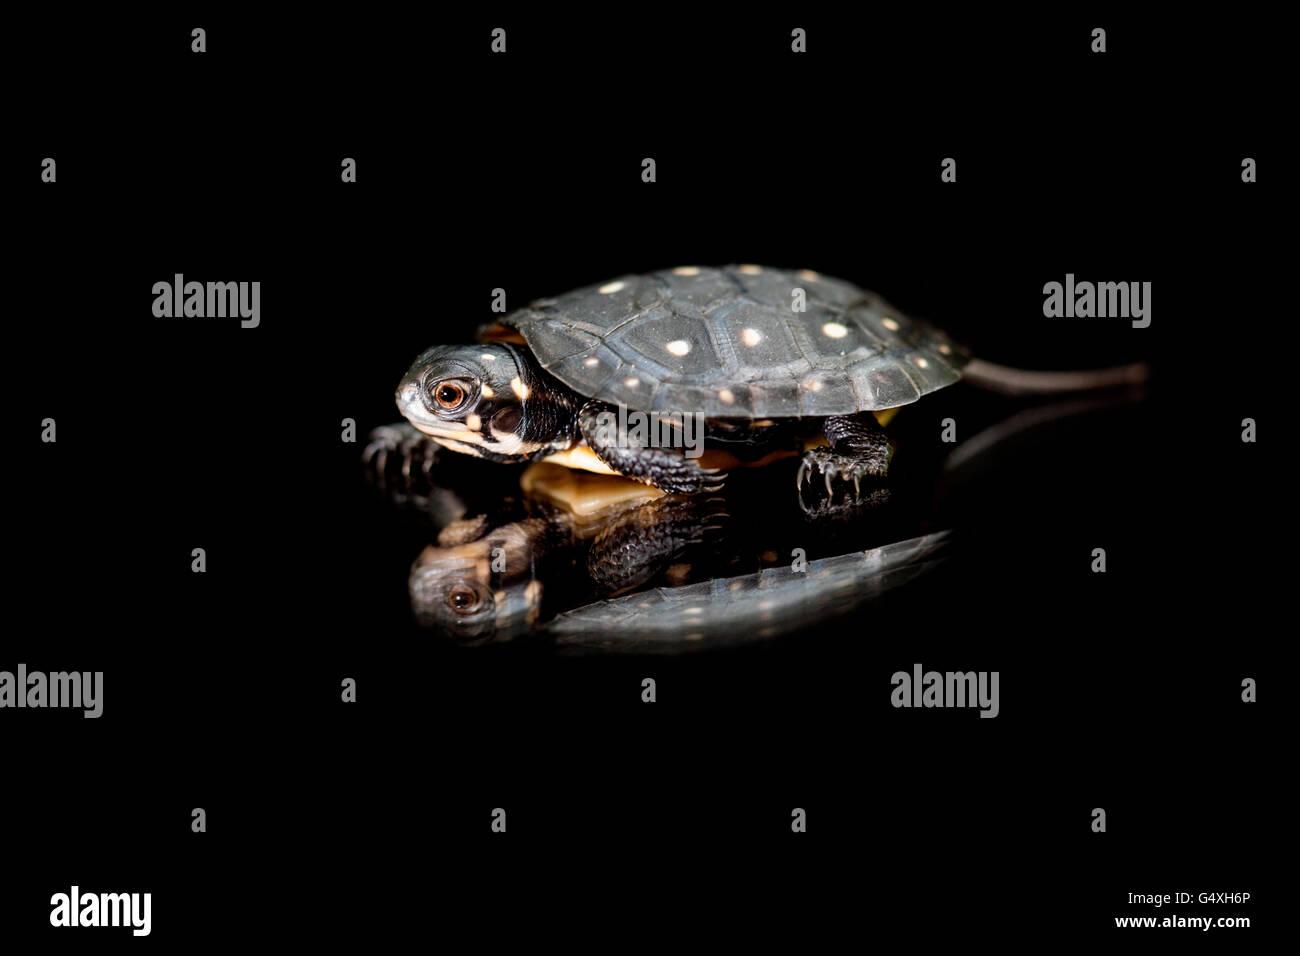 Bebé tortuga (Clemmys guttata) [cautiva] - Brownsville, Texas, EE.UU. Imagen De Stock